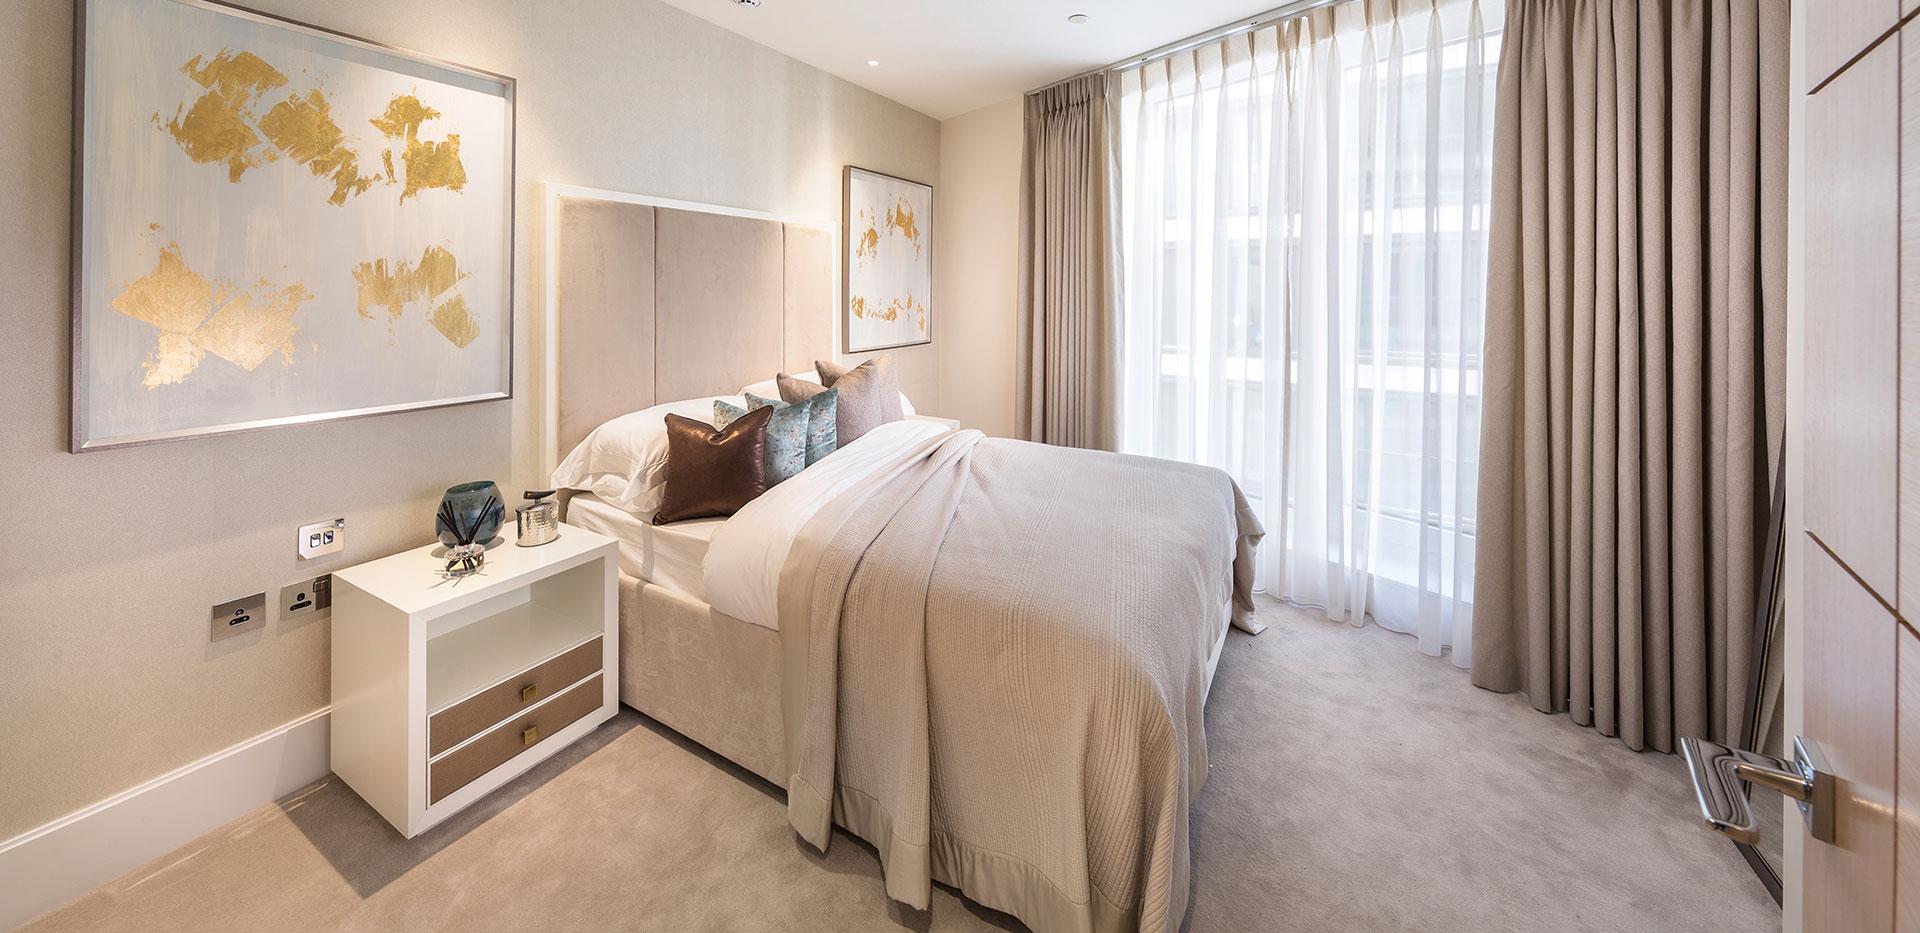 375 Kensington High Street, Benson House, Penthouse Show Apartment, Kitchen, Interior